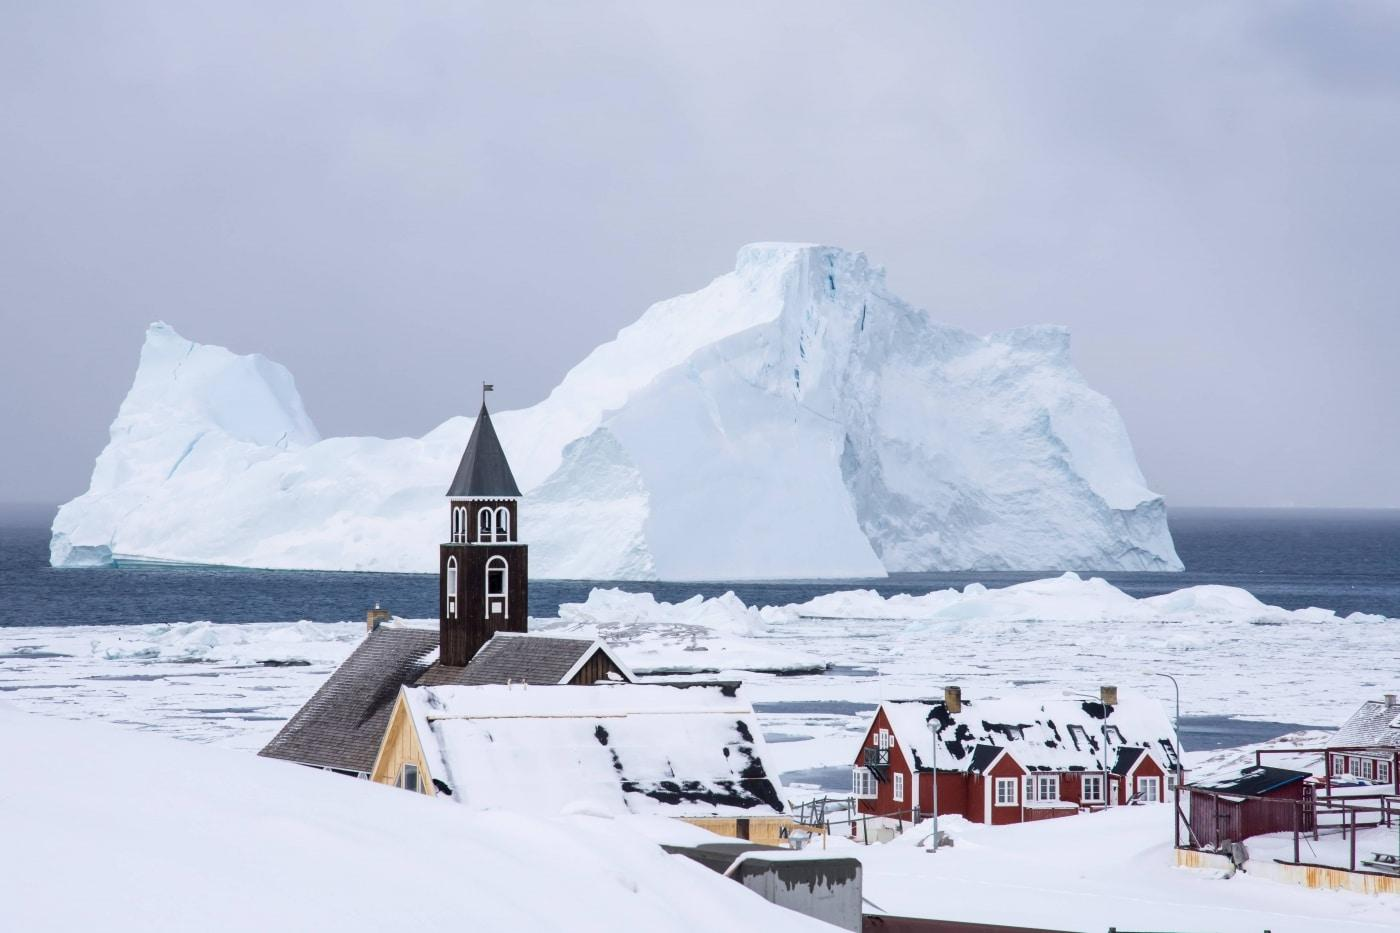 Zions church in Ilulissat. Photo by Inesa Matuliauskaite, Visit Greenland